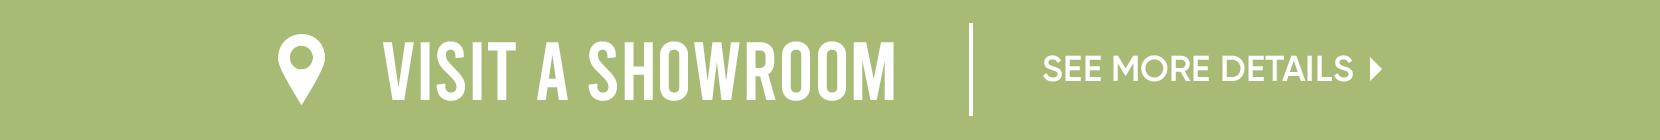 visit a showroom. see more details.